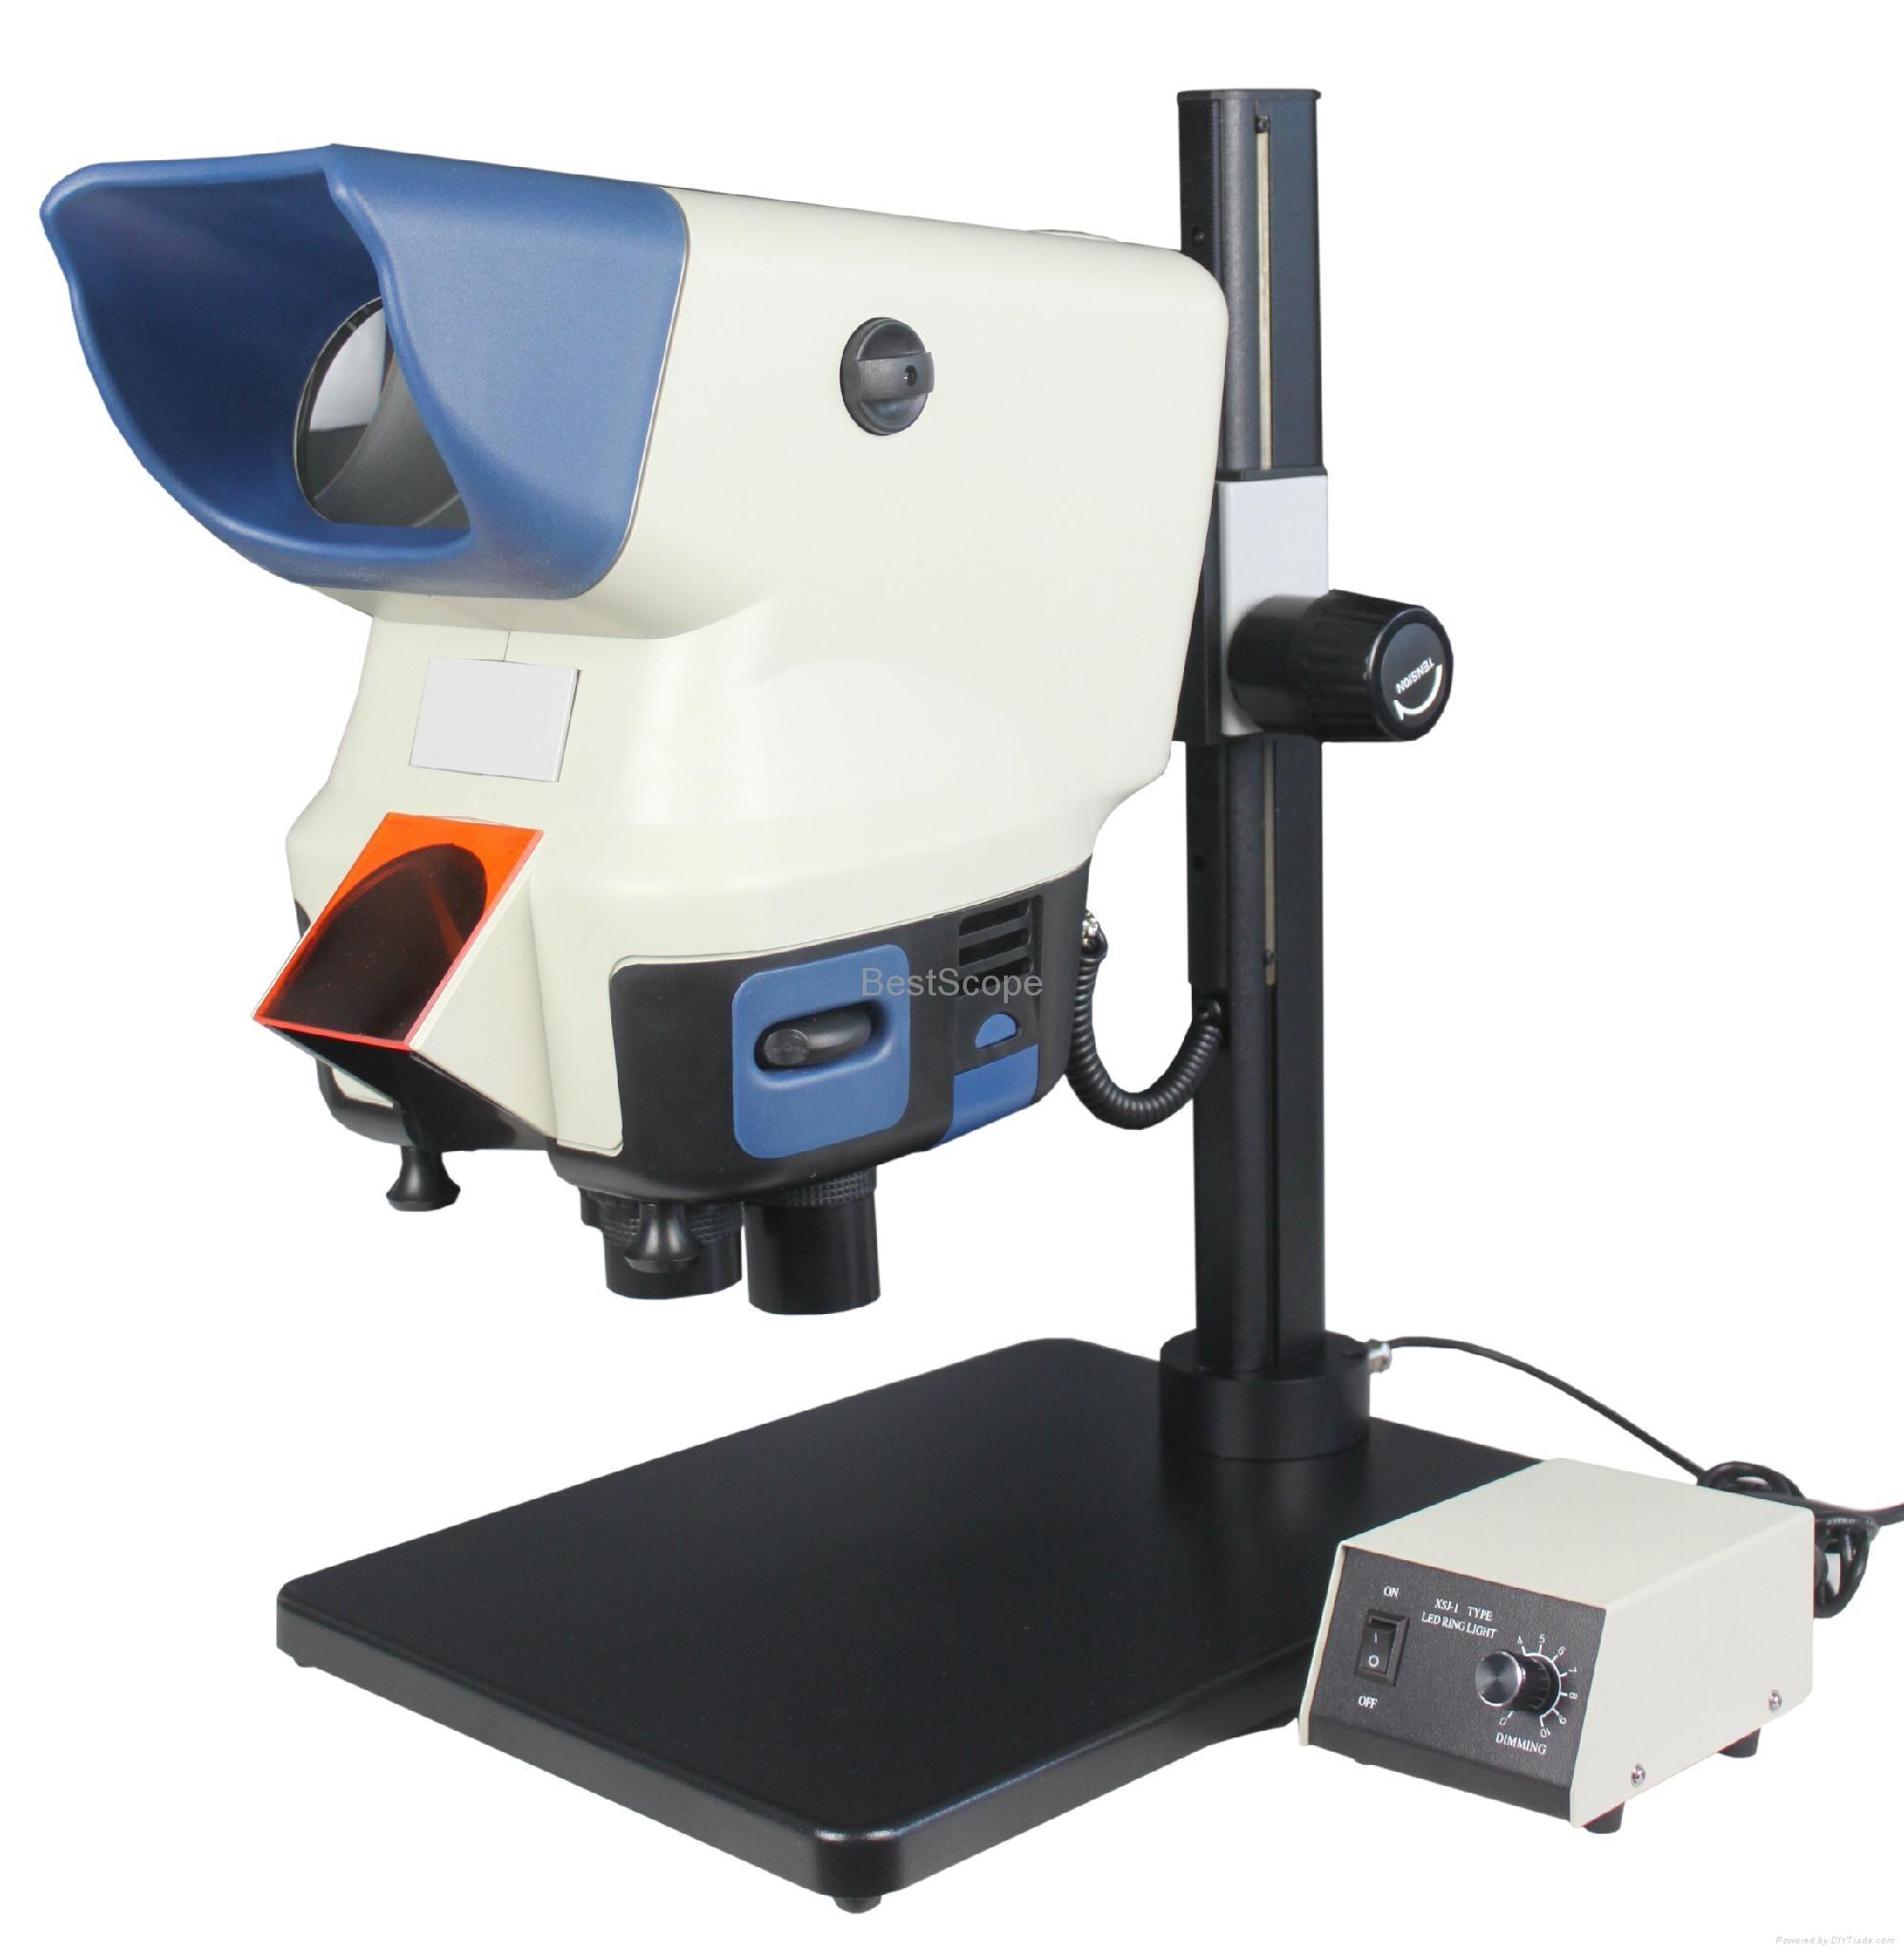 Bestscope BS-3070 Wide Field Stereo Microscope 2